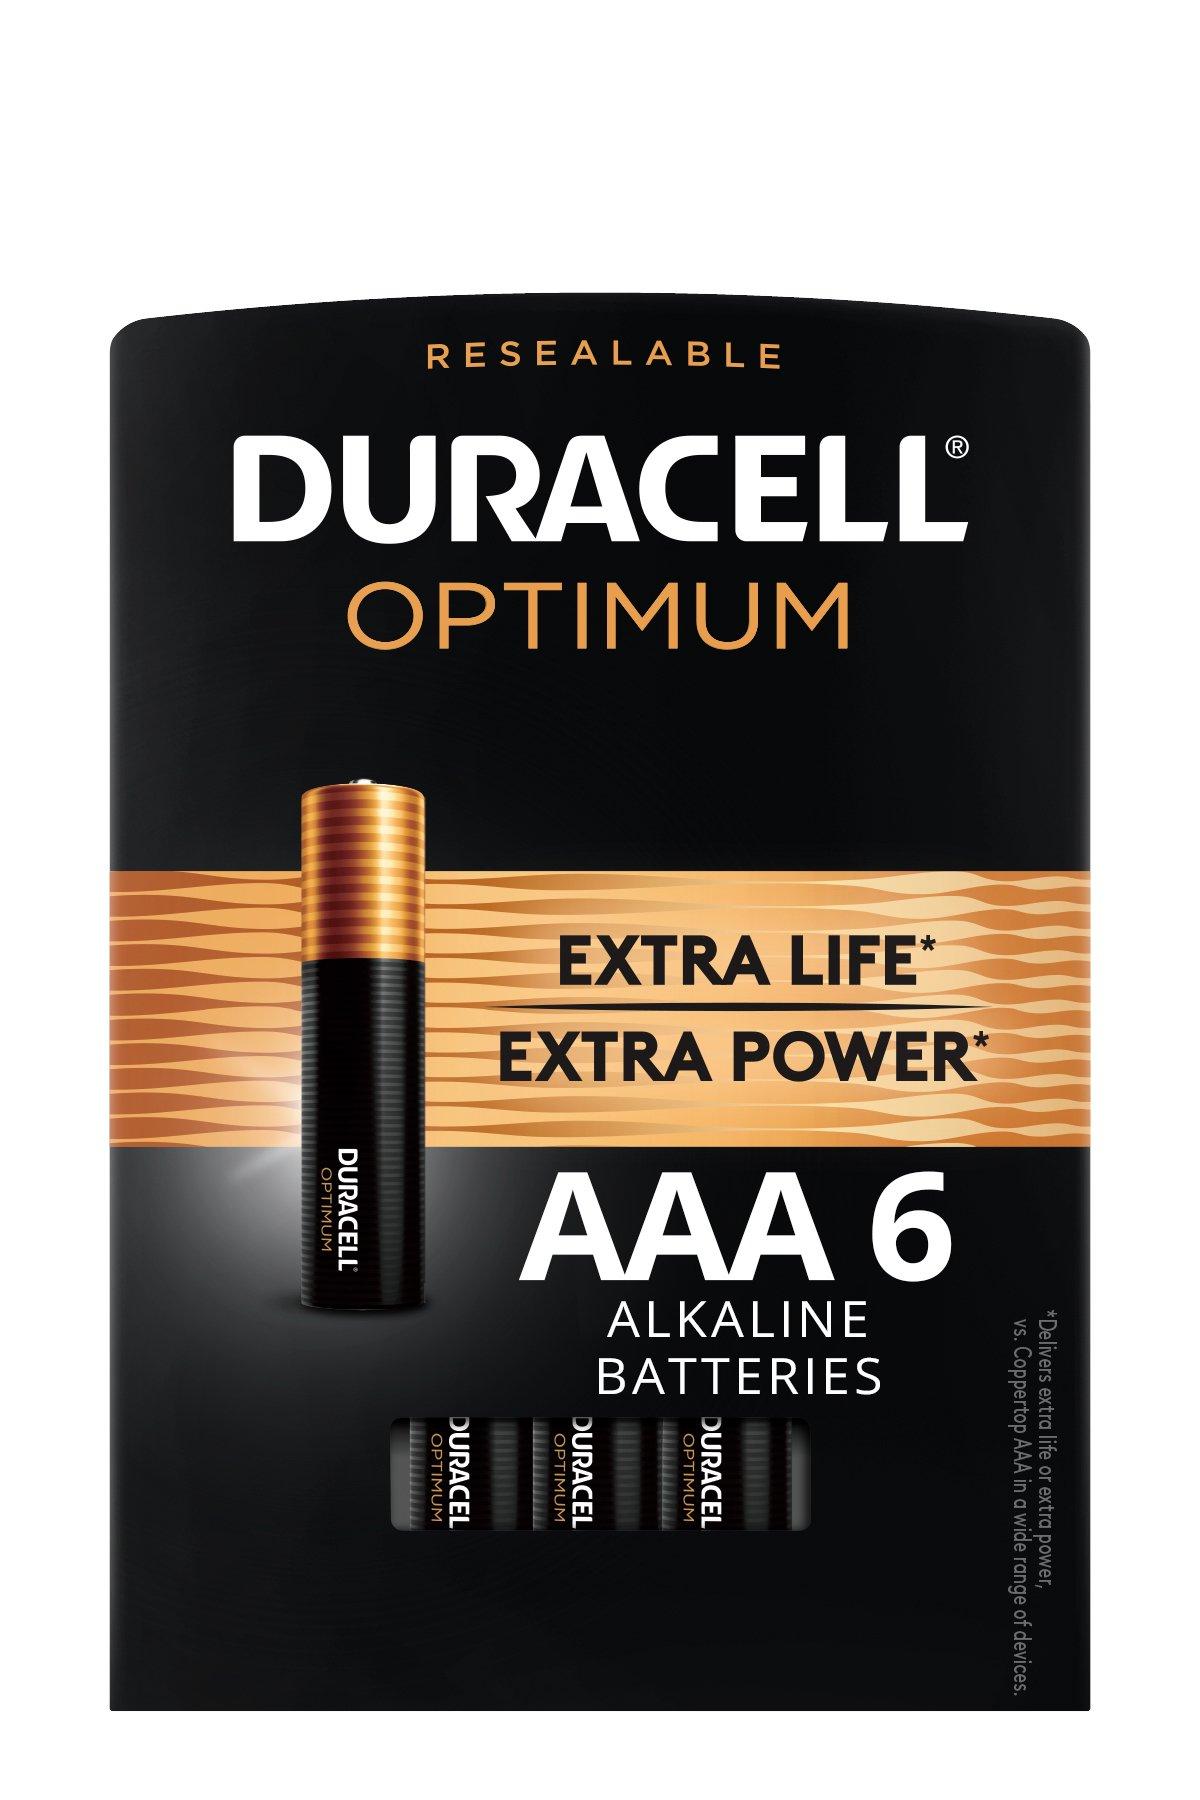 Duracell Optimum 1.5V Alkaline AAA Batteries, Convenient, Resealable Package, 6 Pack